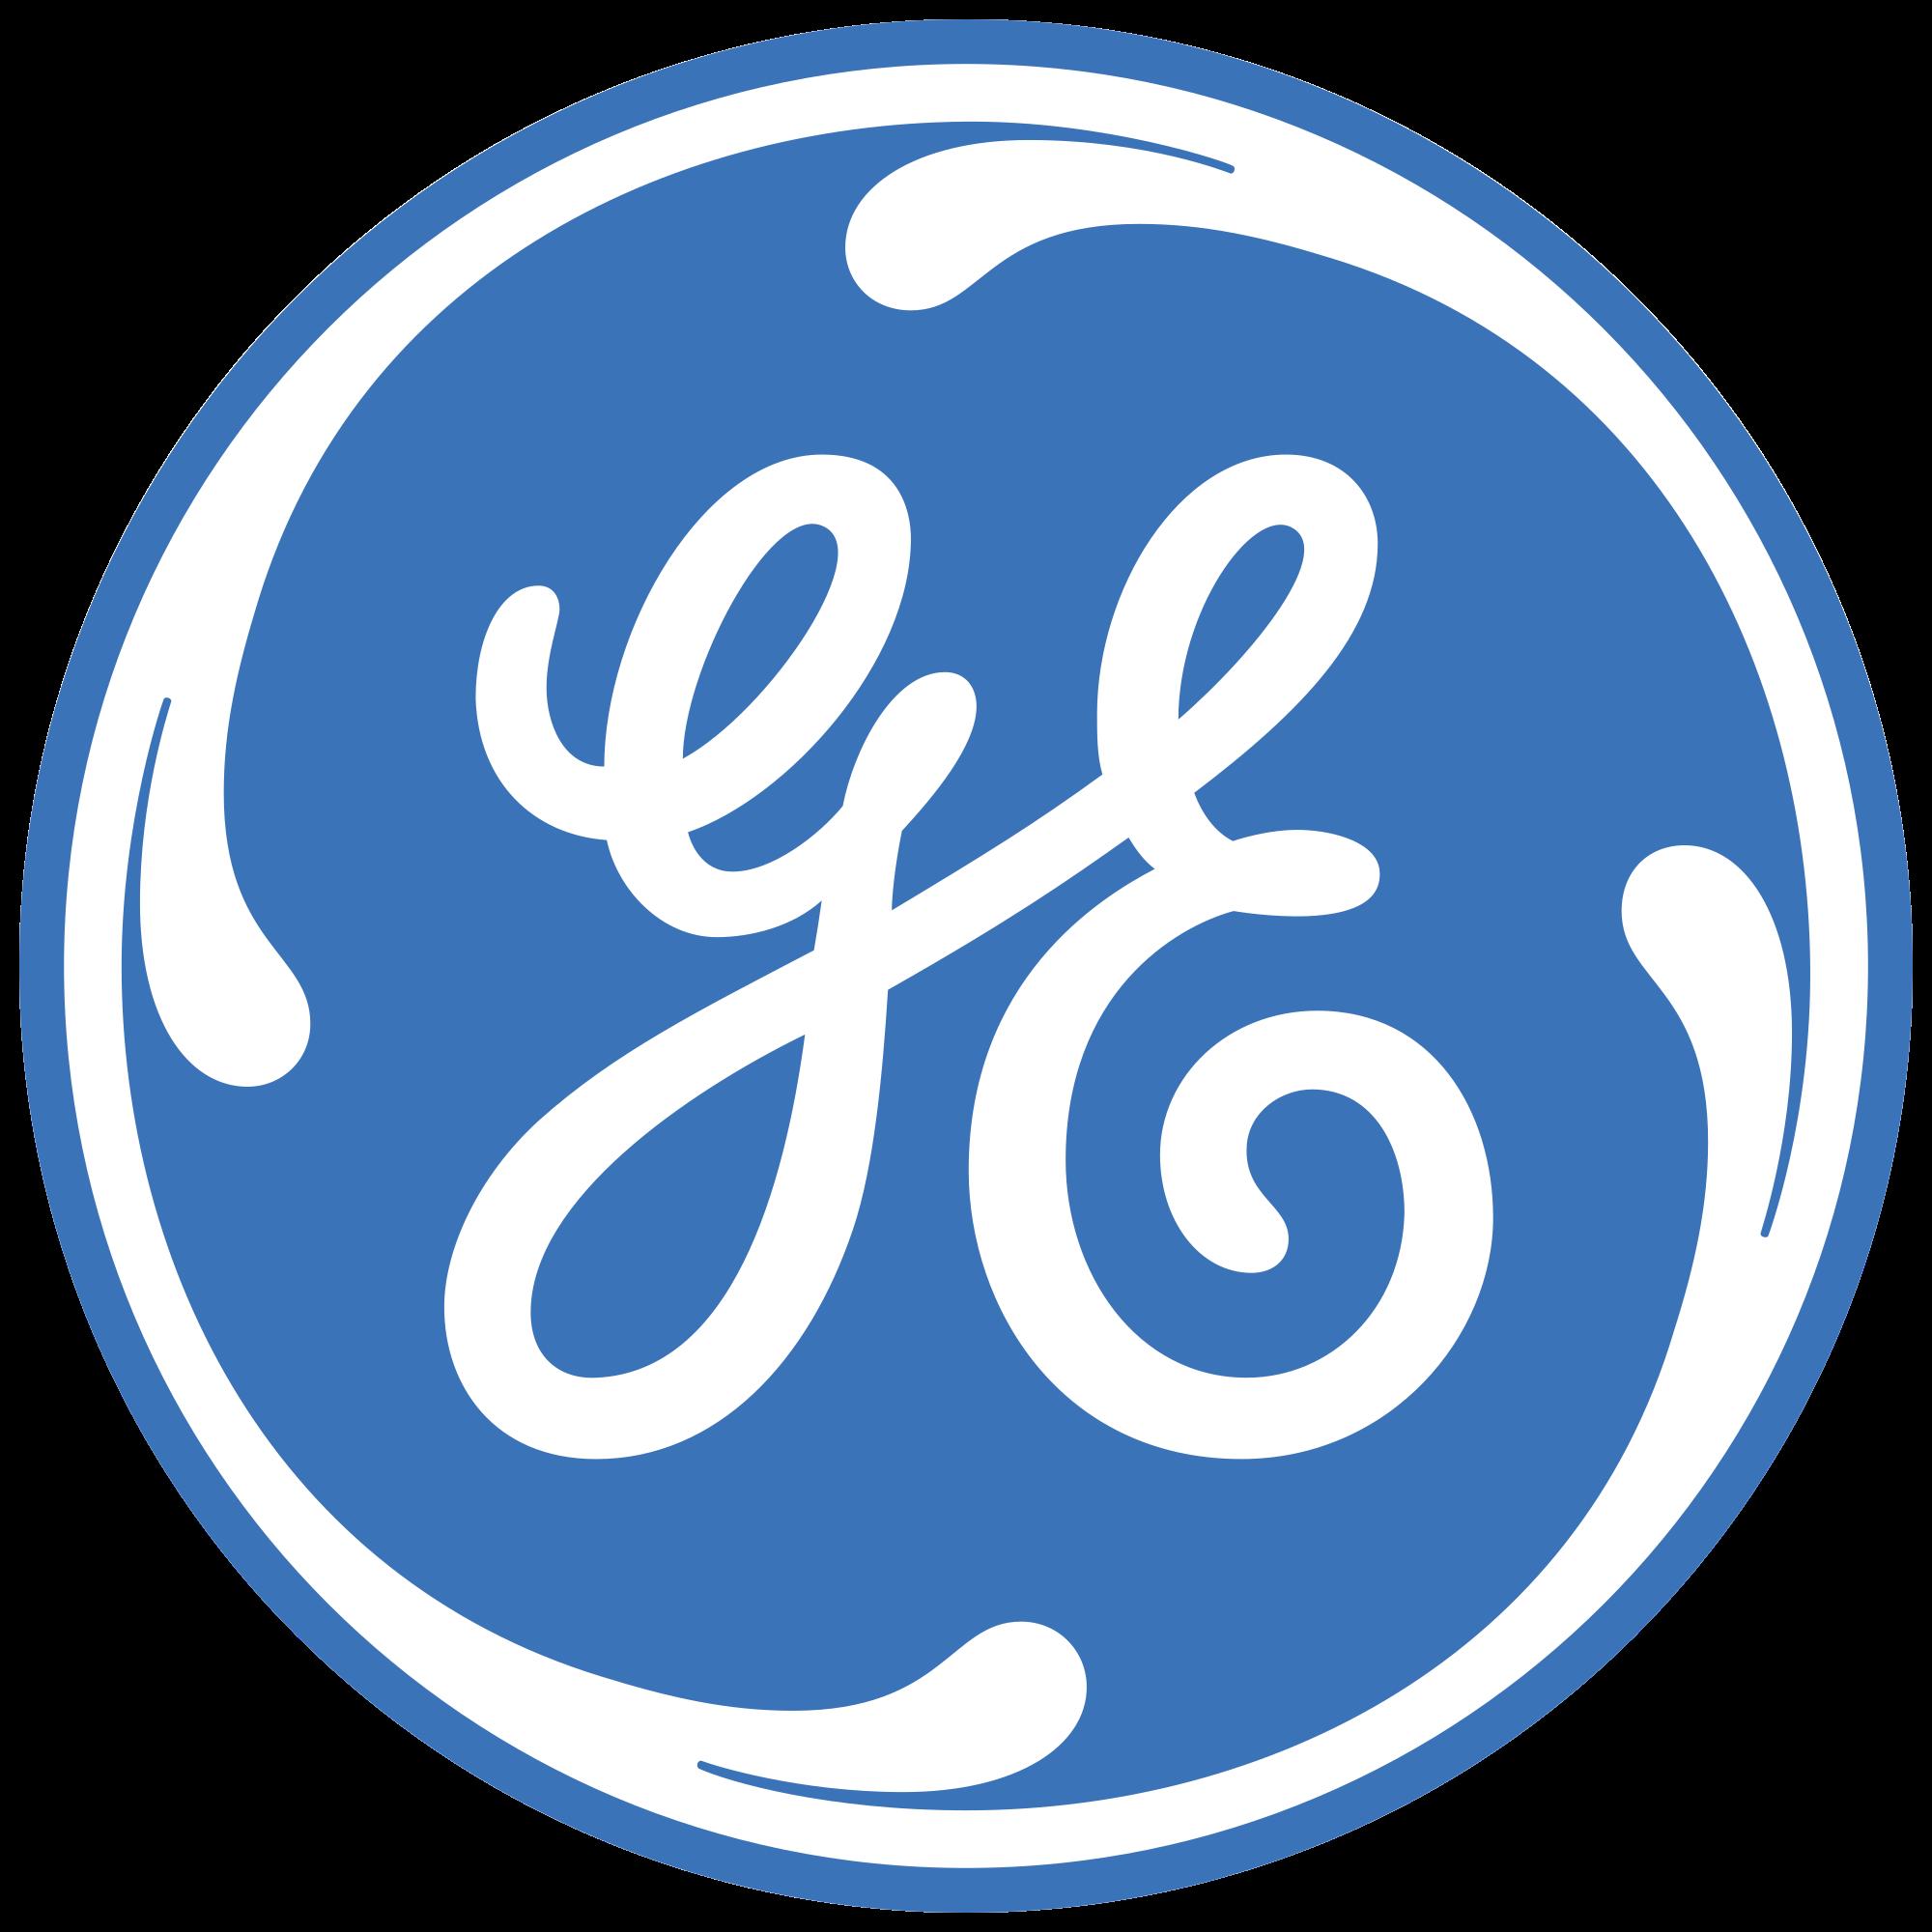 GE.png